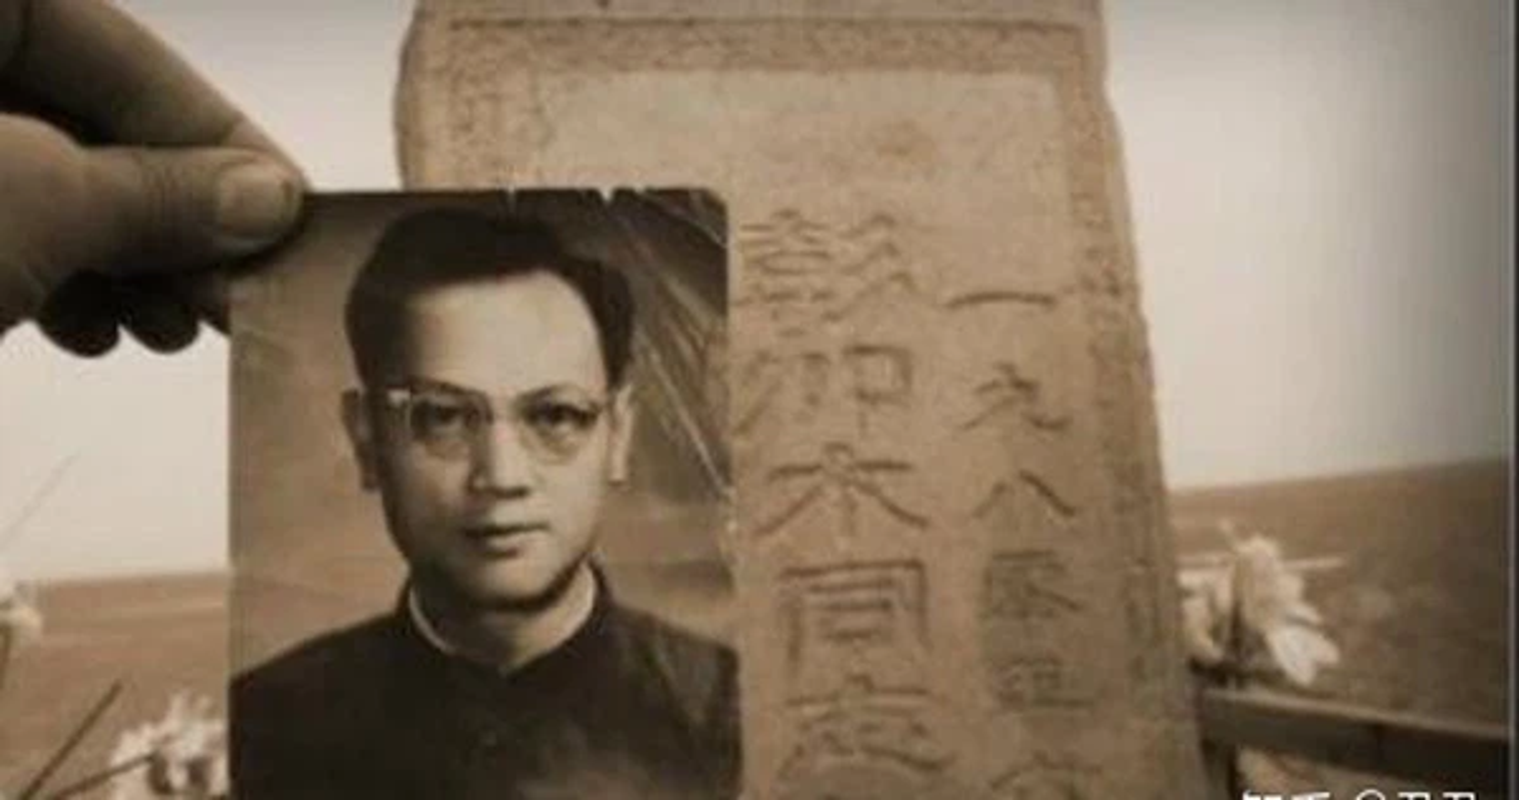 Ngoc boi song ngu - bi an ky la nhat cua Trung Quoc-Hinh-3